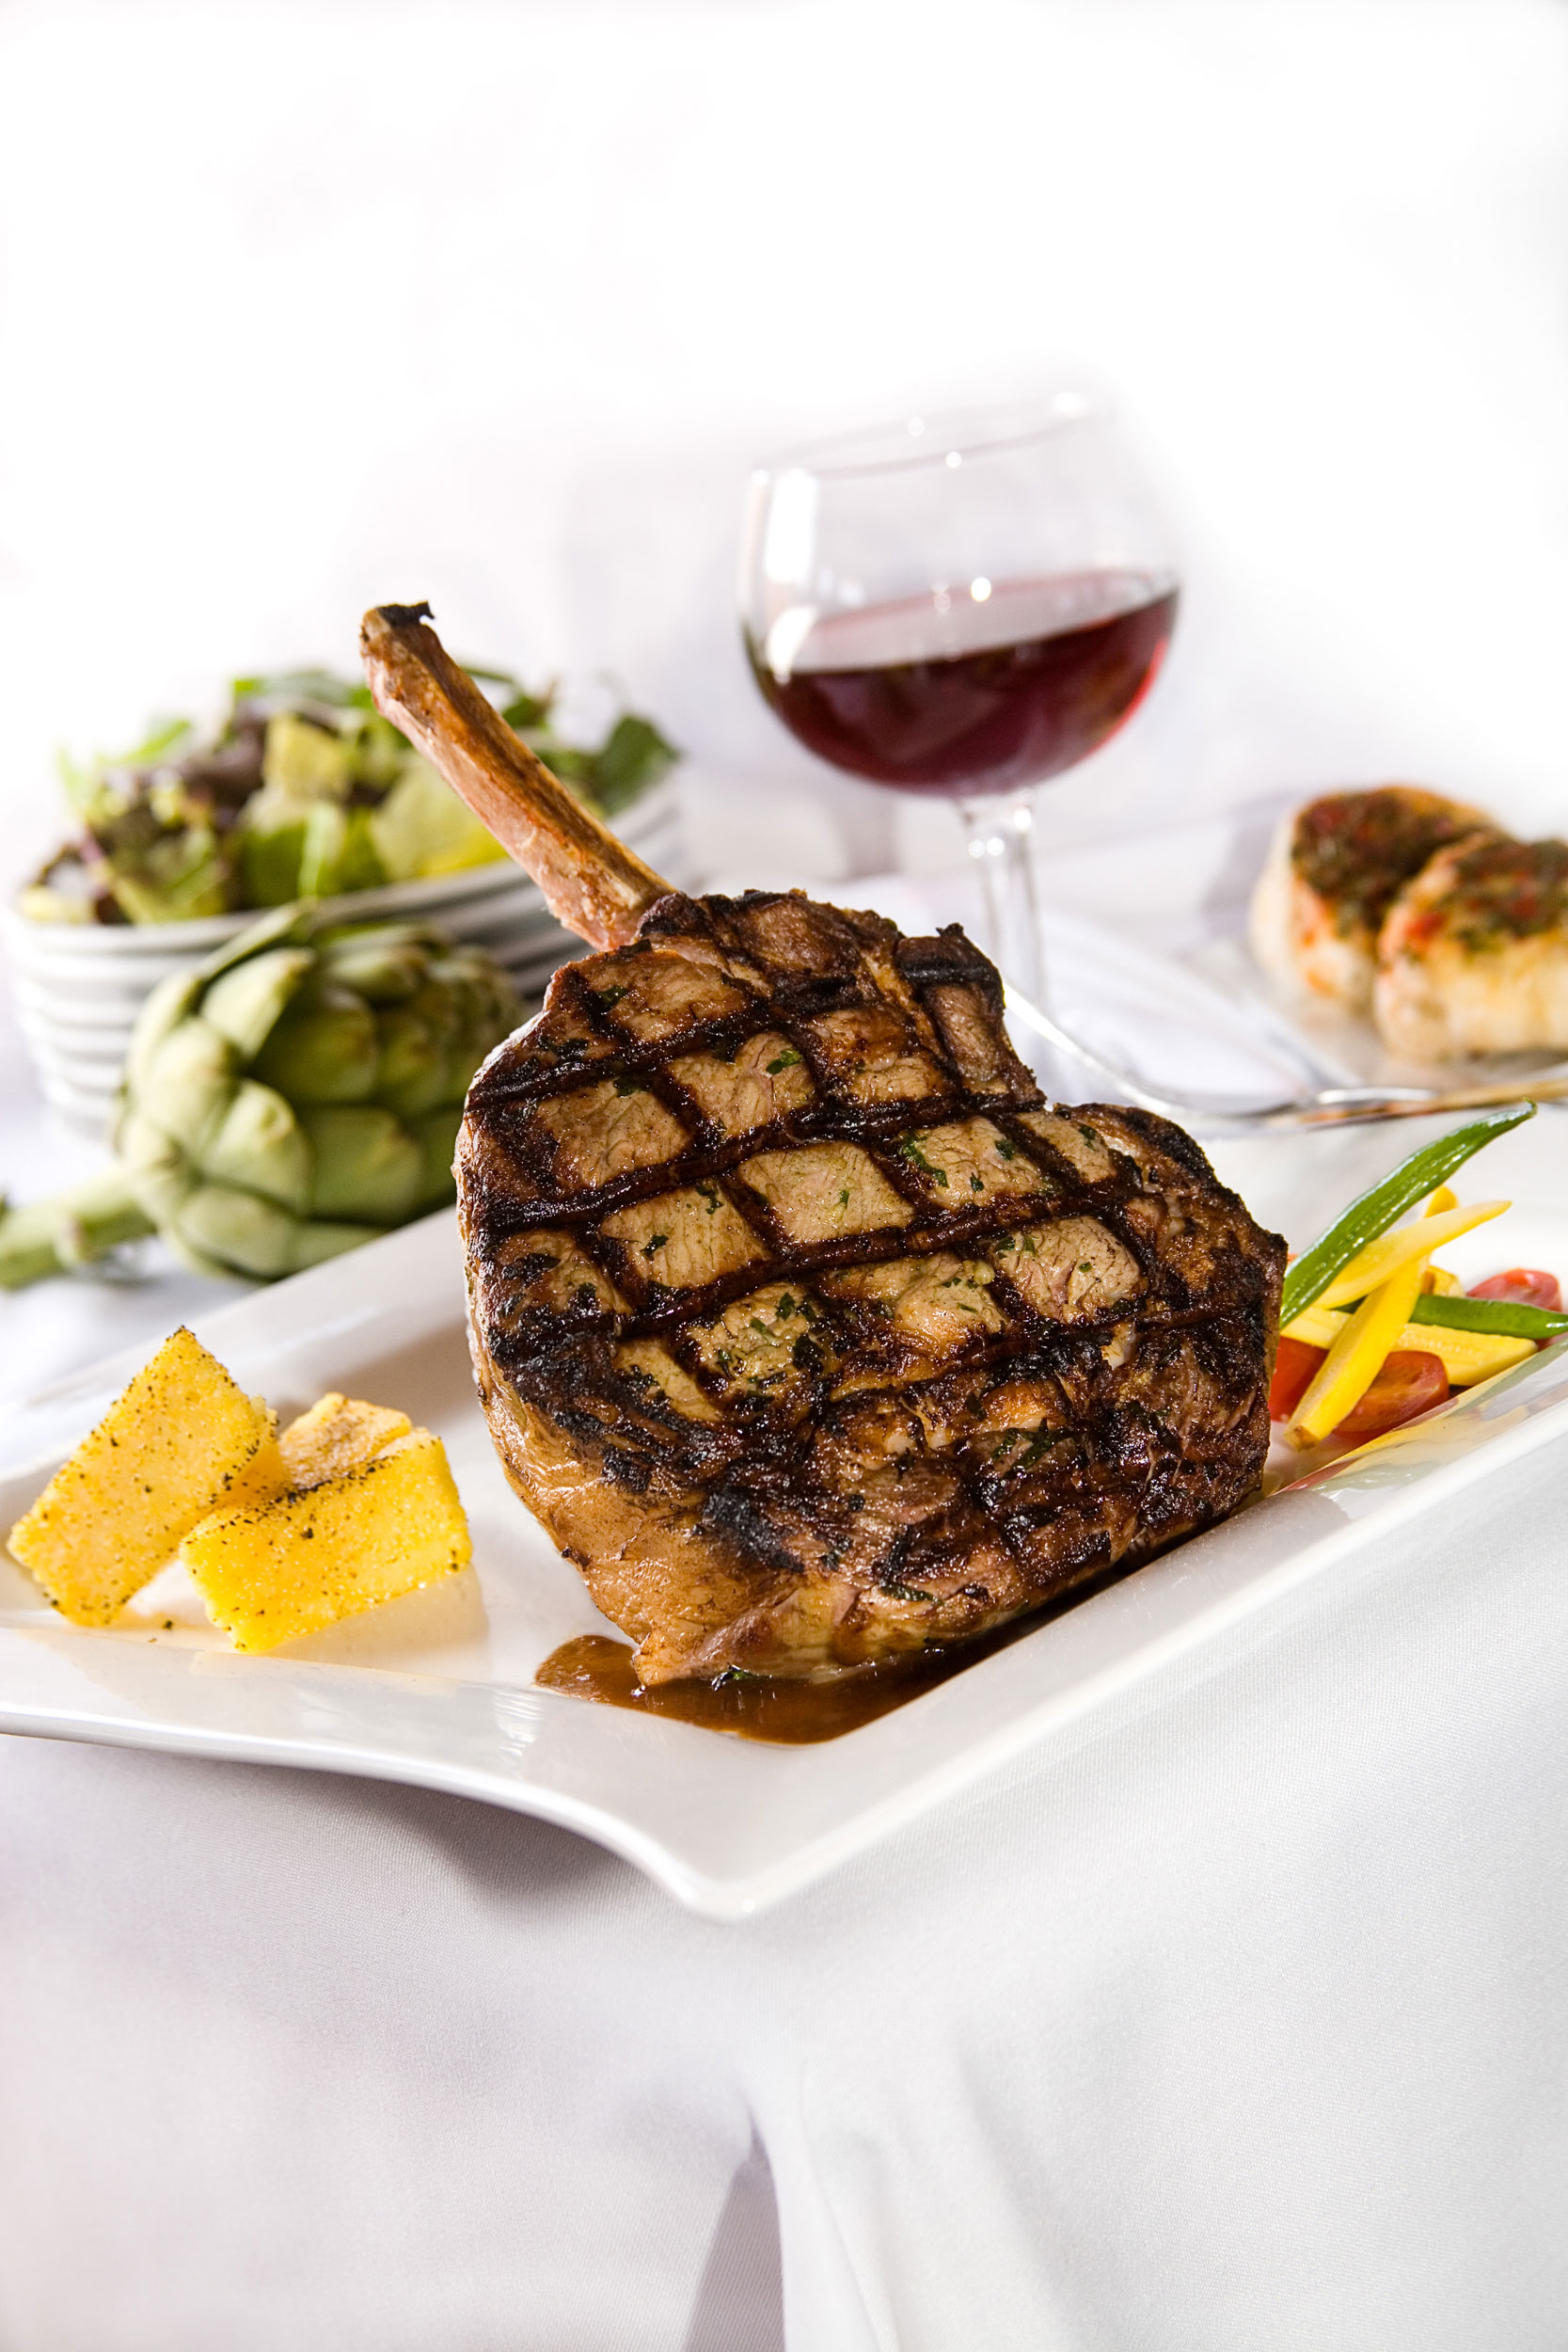 09 Tomahawk-Steak-Fish-Grotto-small.jpg